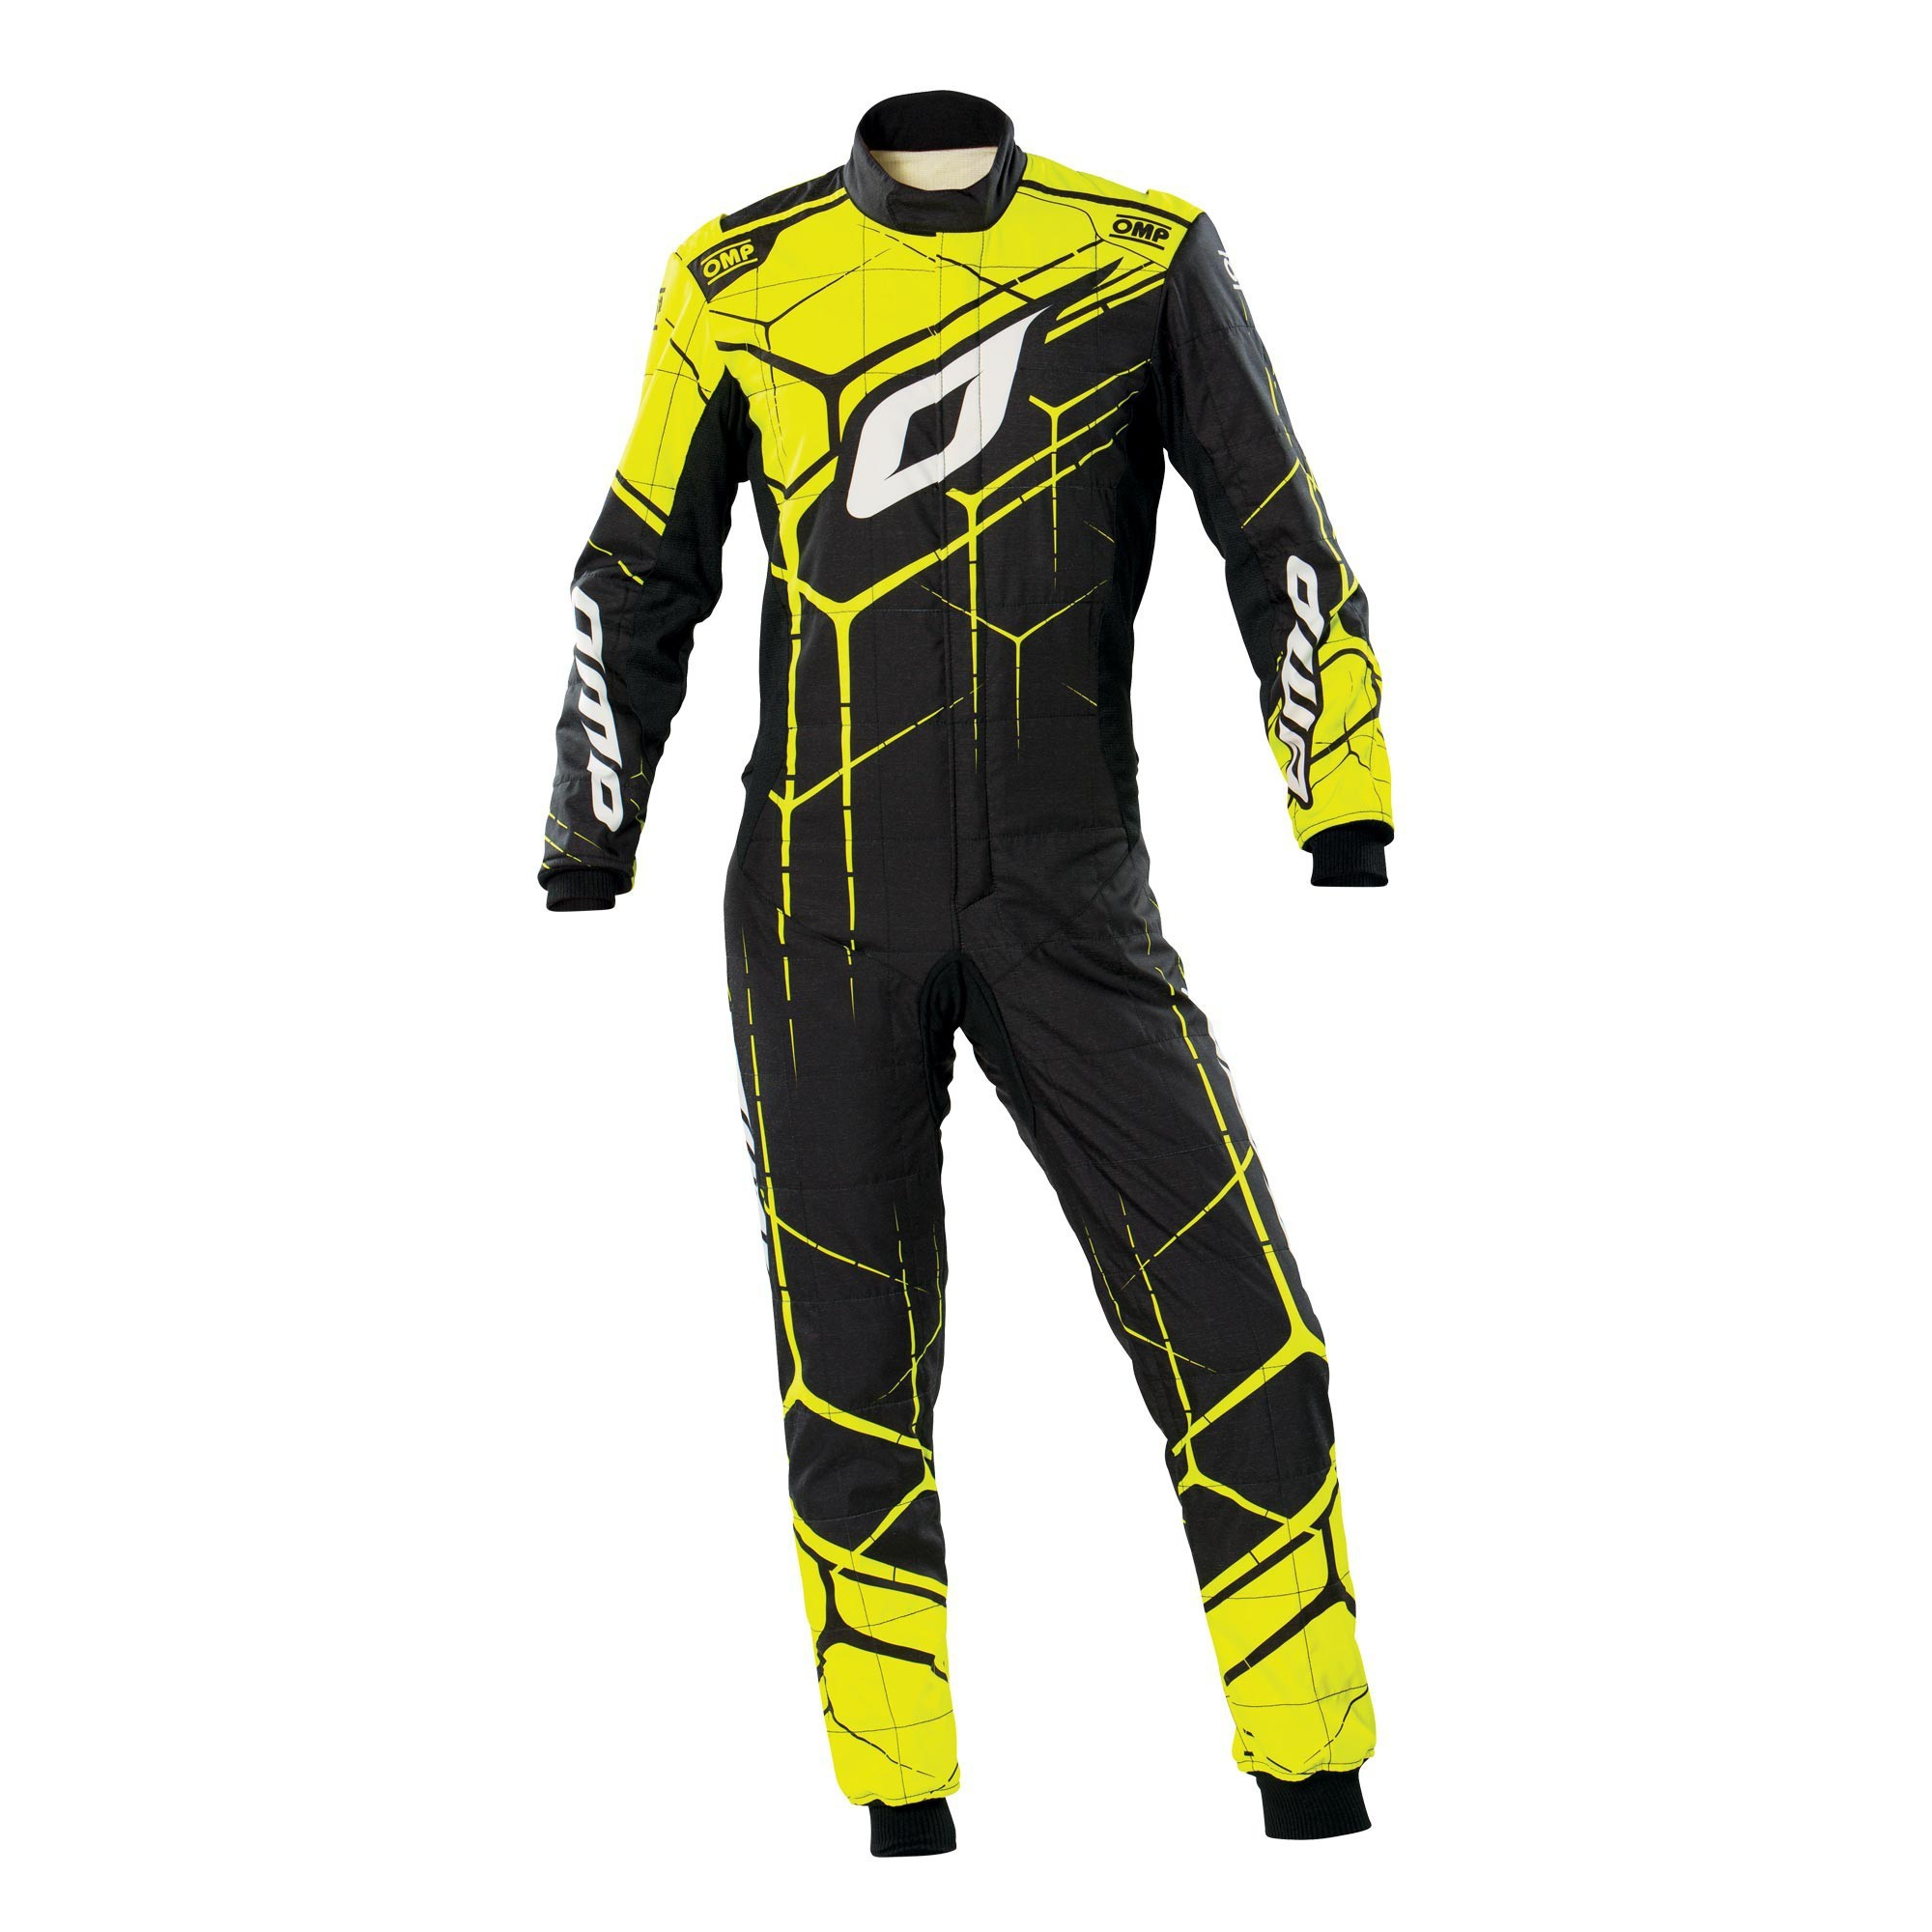 Macacão Racing One Art 2020 OMP